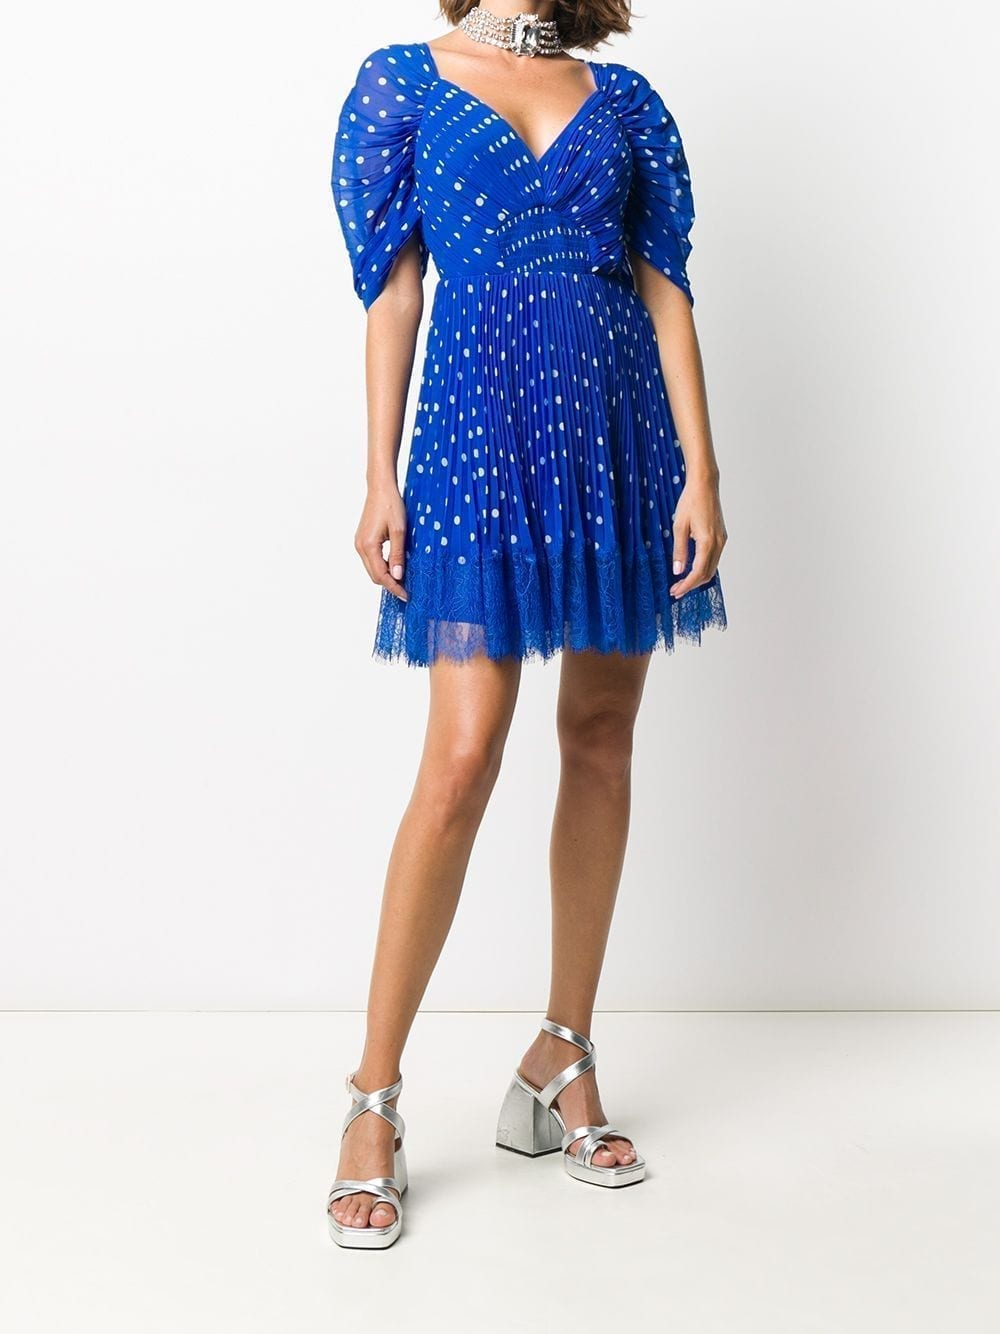 SELF-PORTRAIT Polka-dot Print Dress